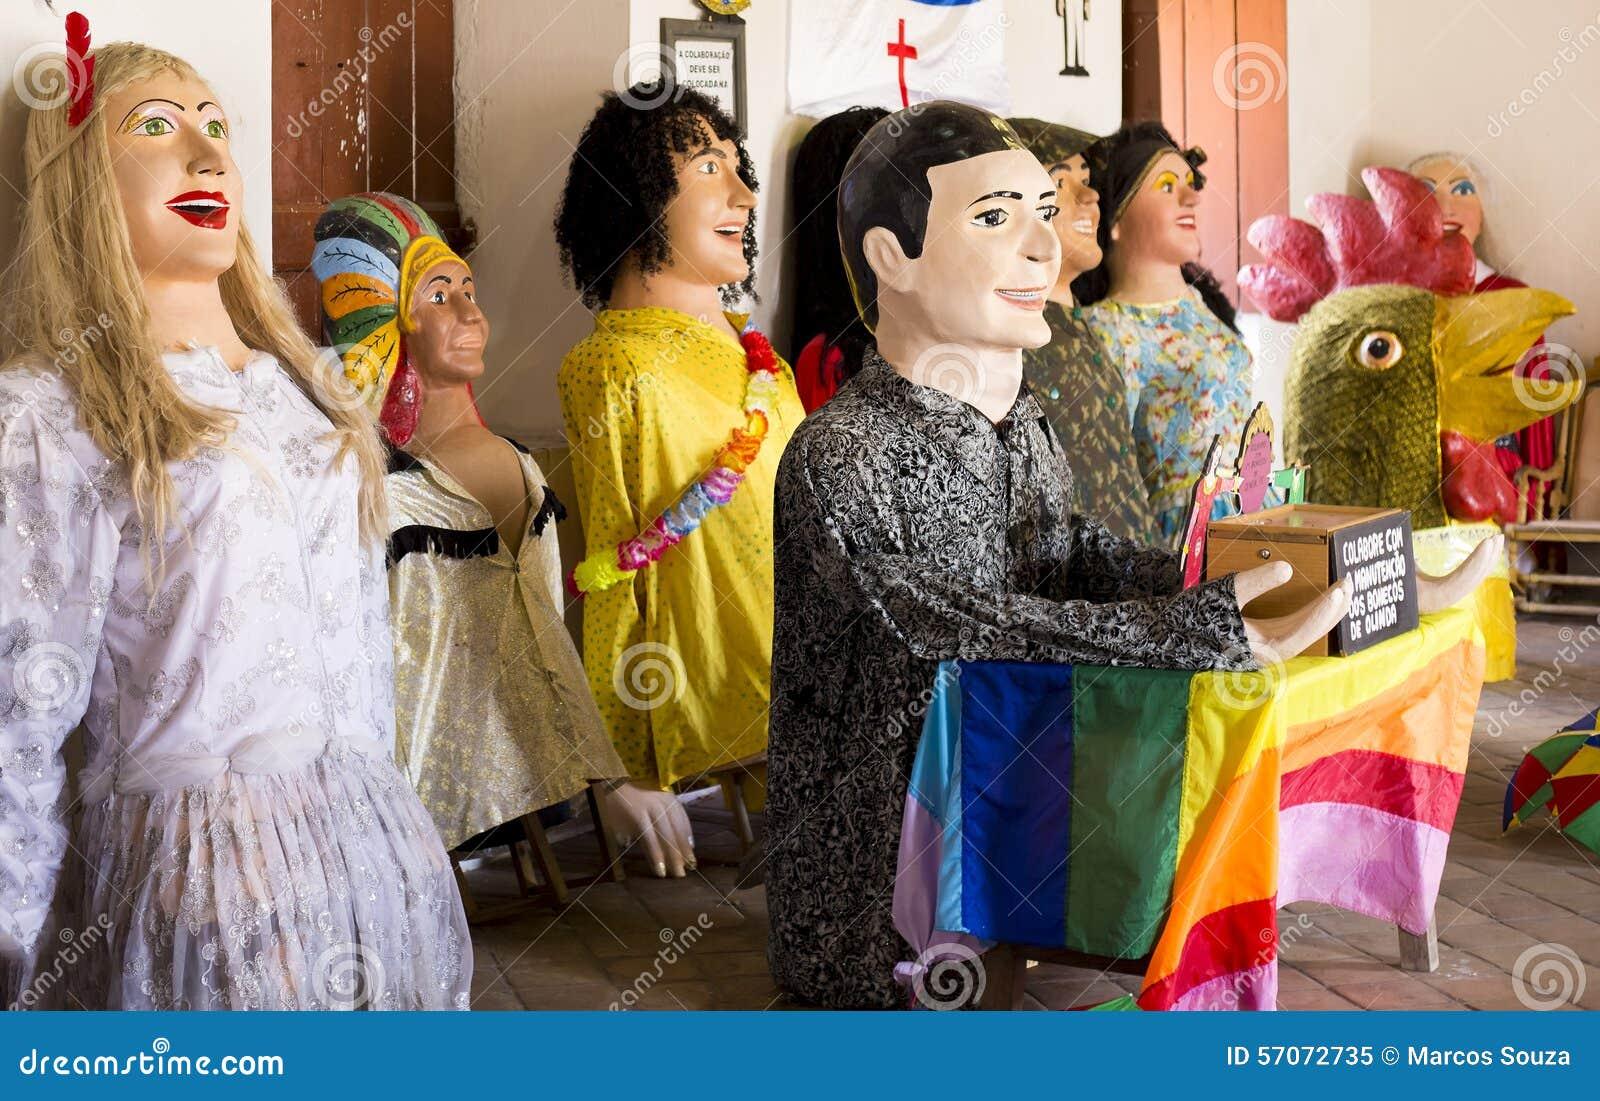 Brazilian Carnival Costumes Stock Image , Image of travel